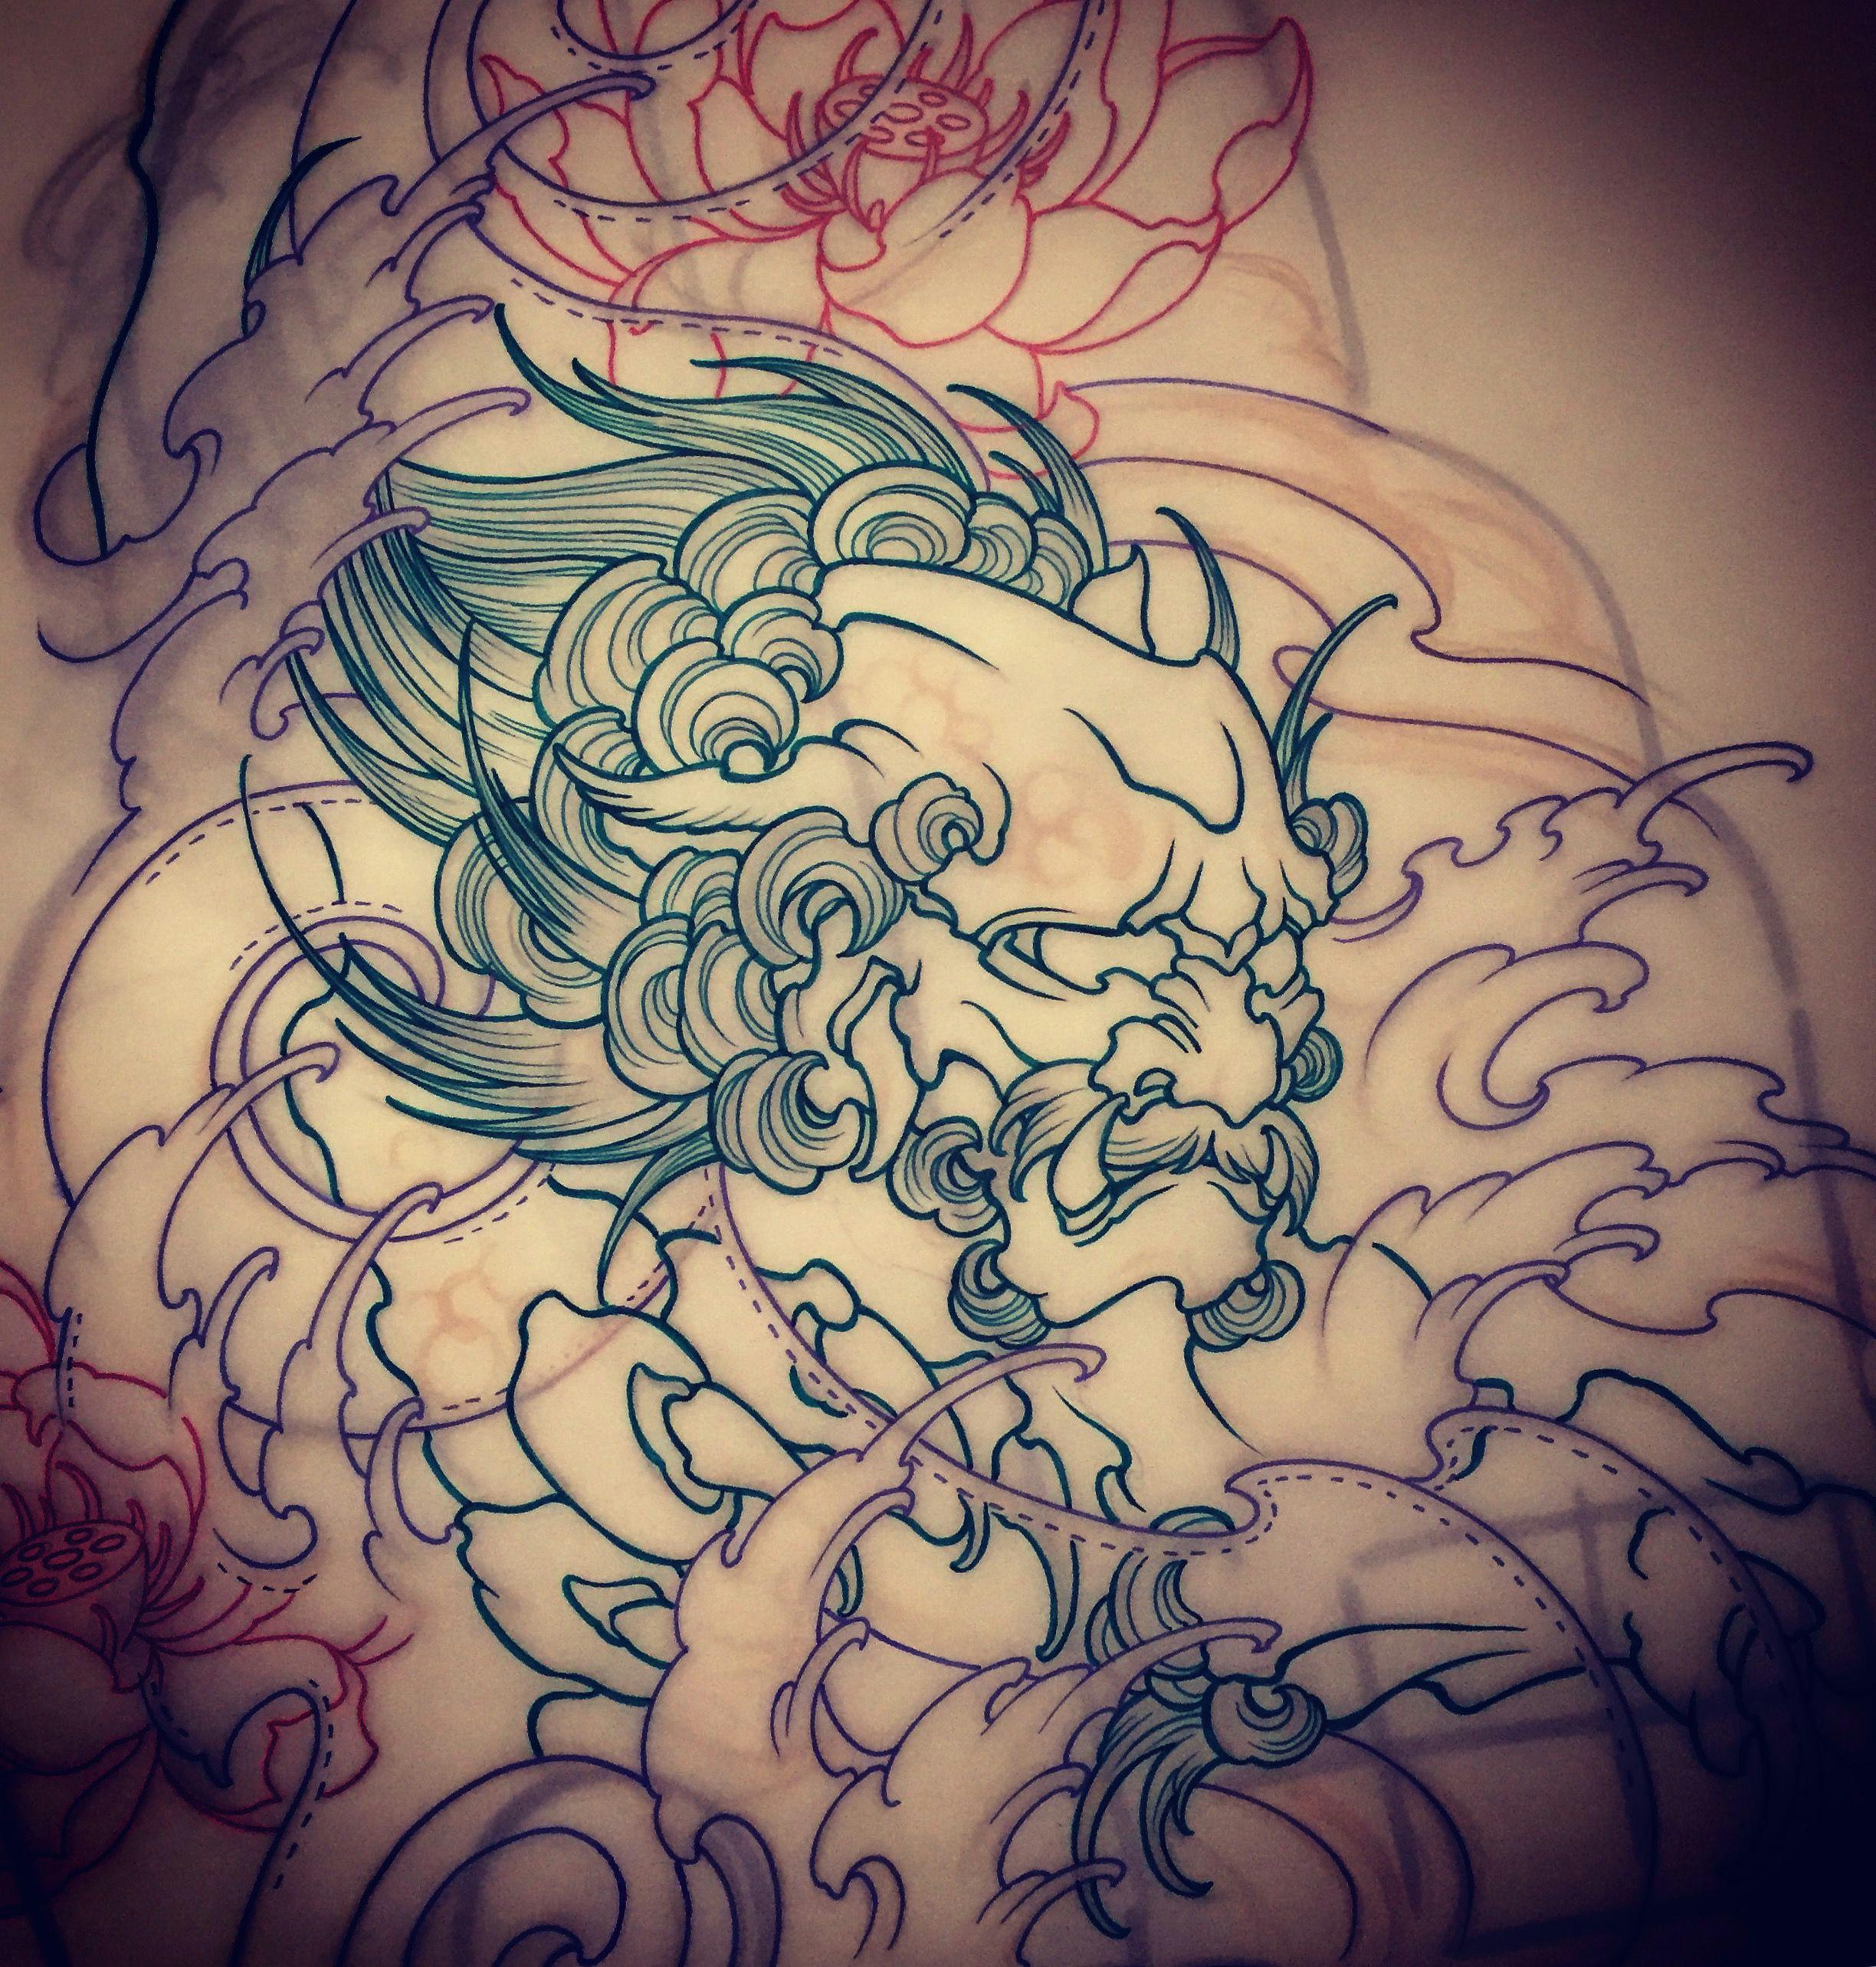 amsterdam tattoo 1825 kimihito foo dog japanese style tattoo design